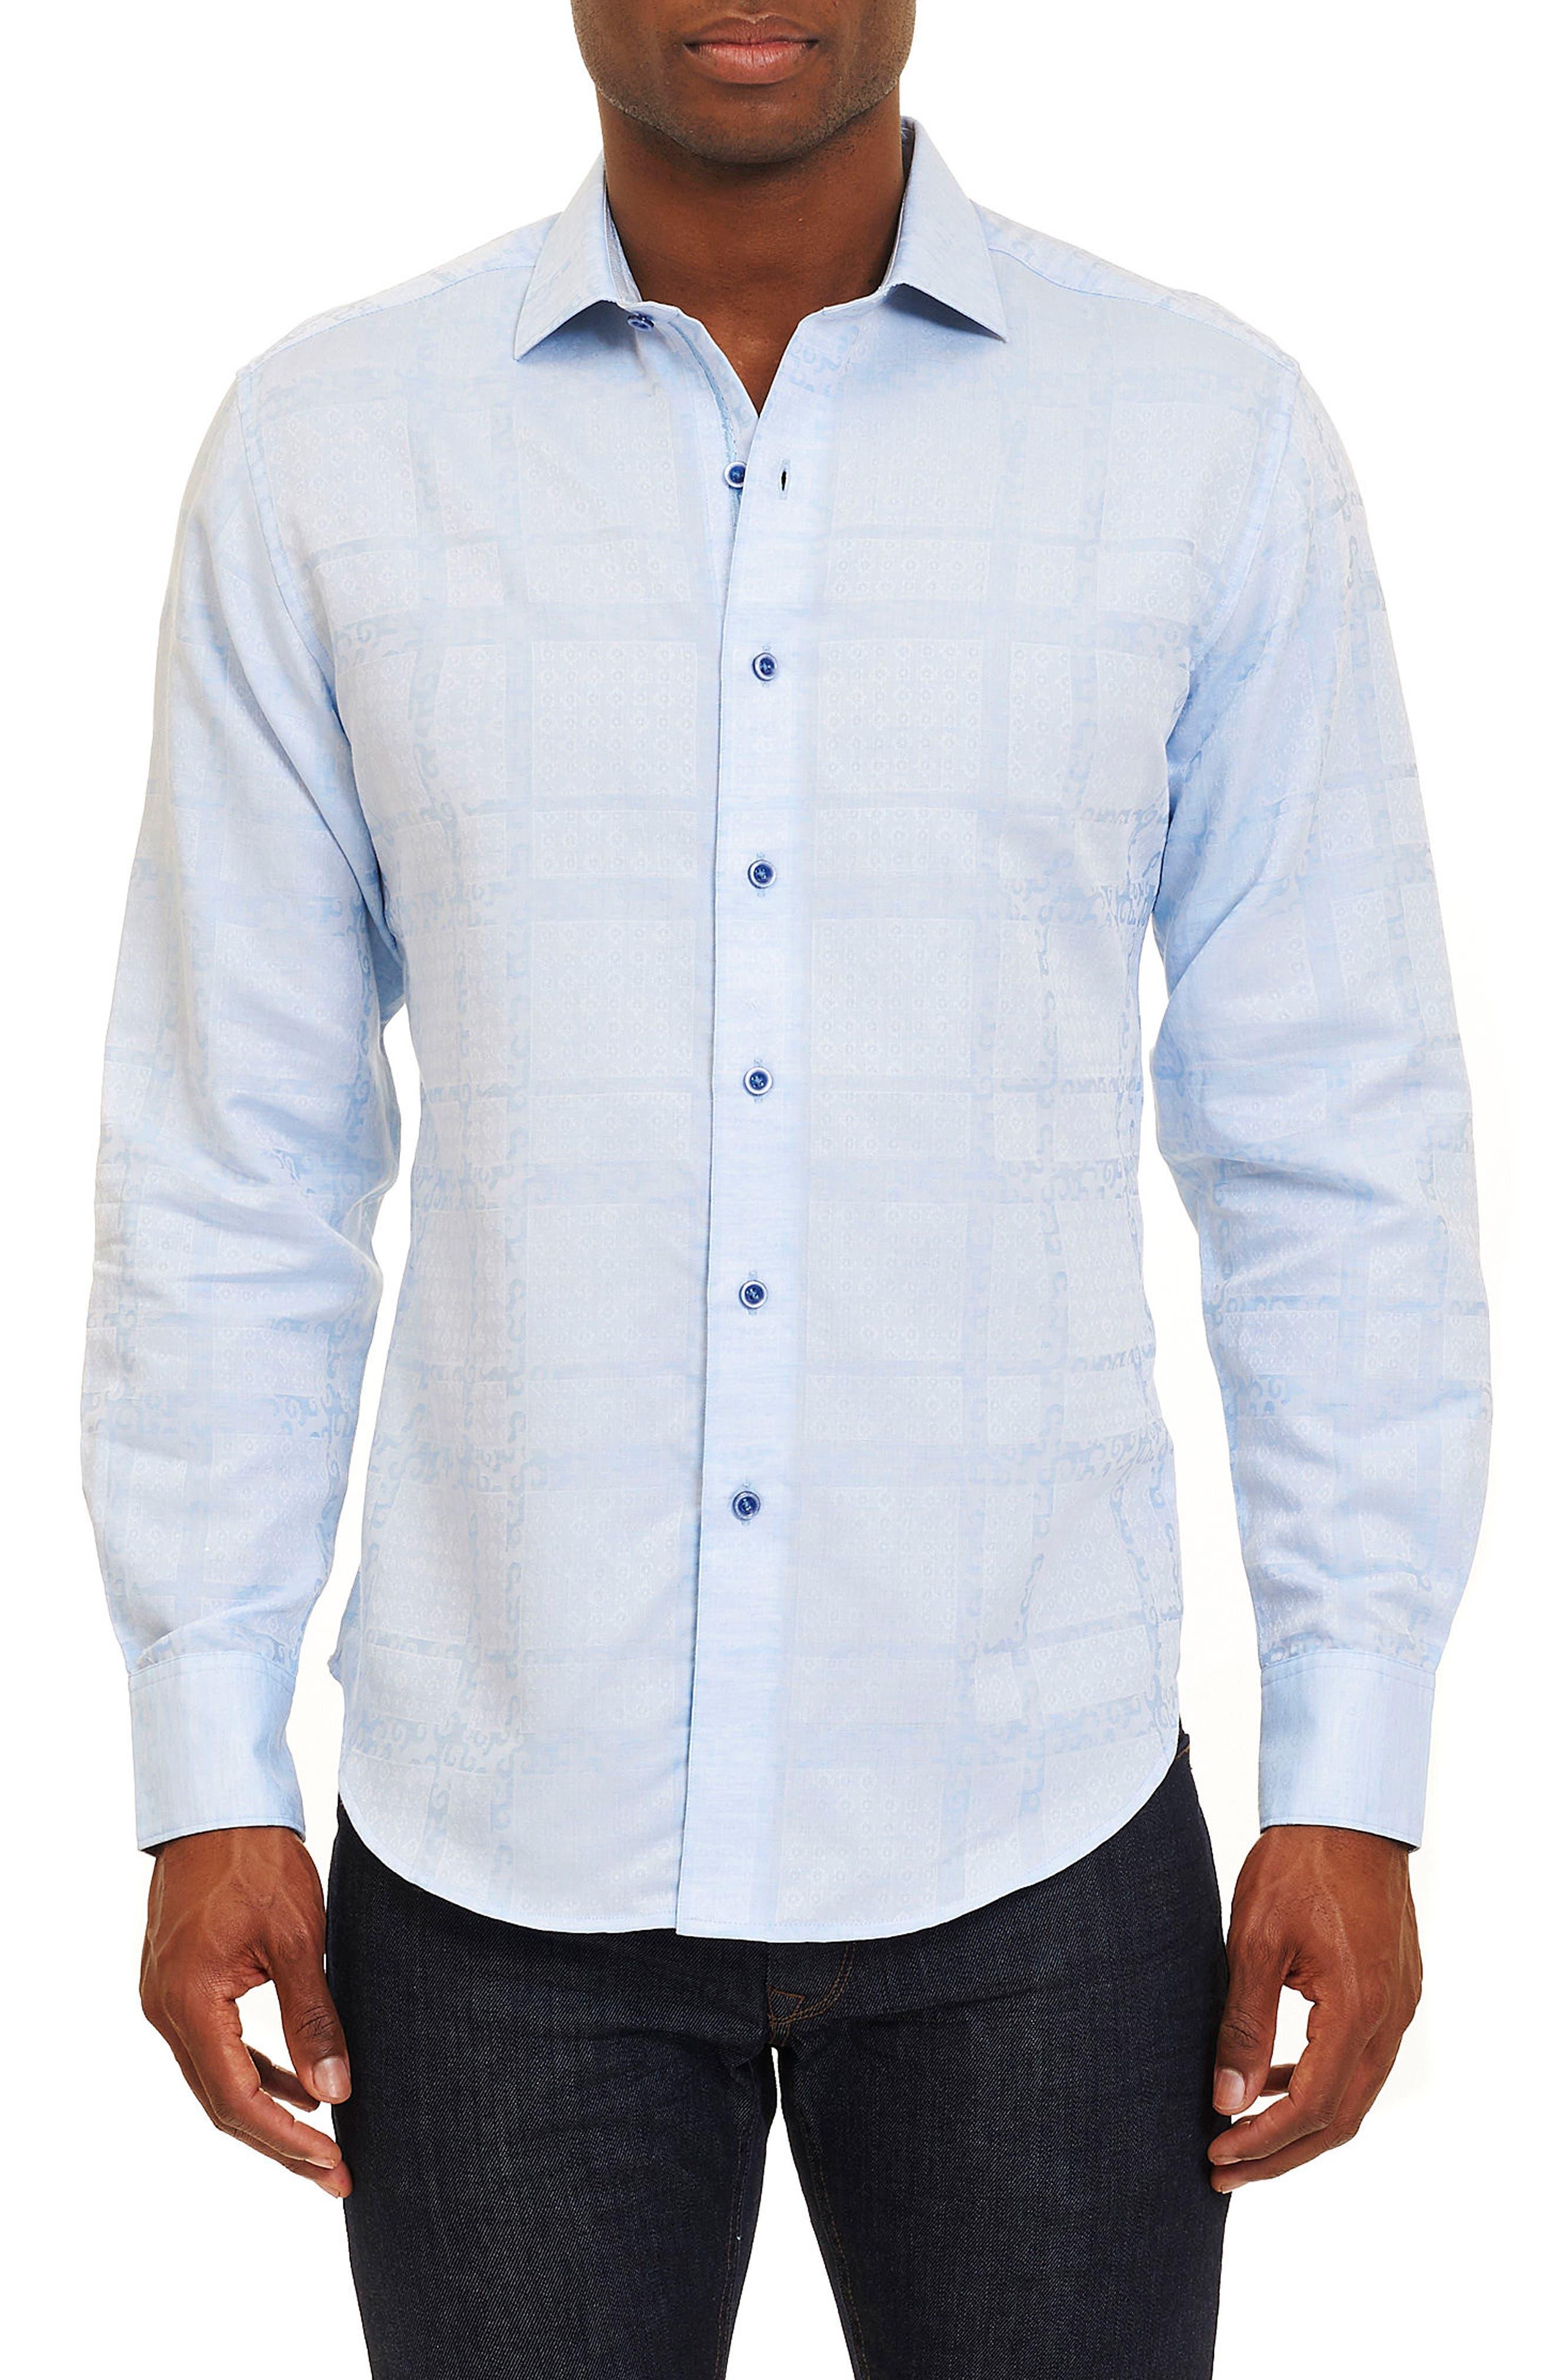 Alternate Image 1 Selected - Robert Graham Morley Sport Shirt